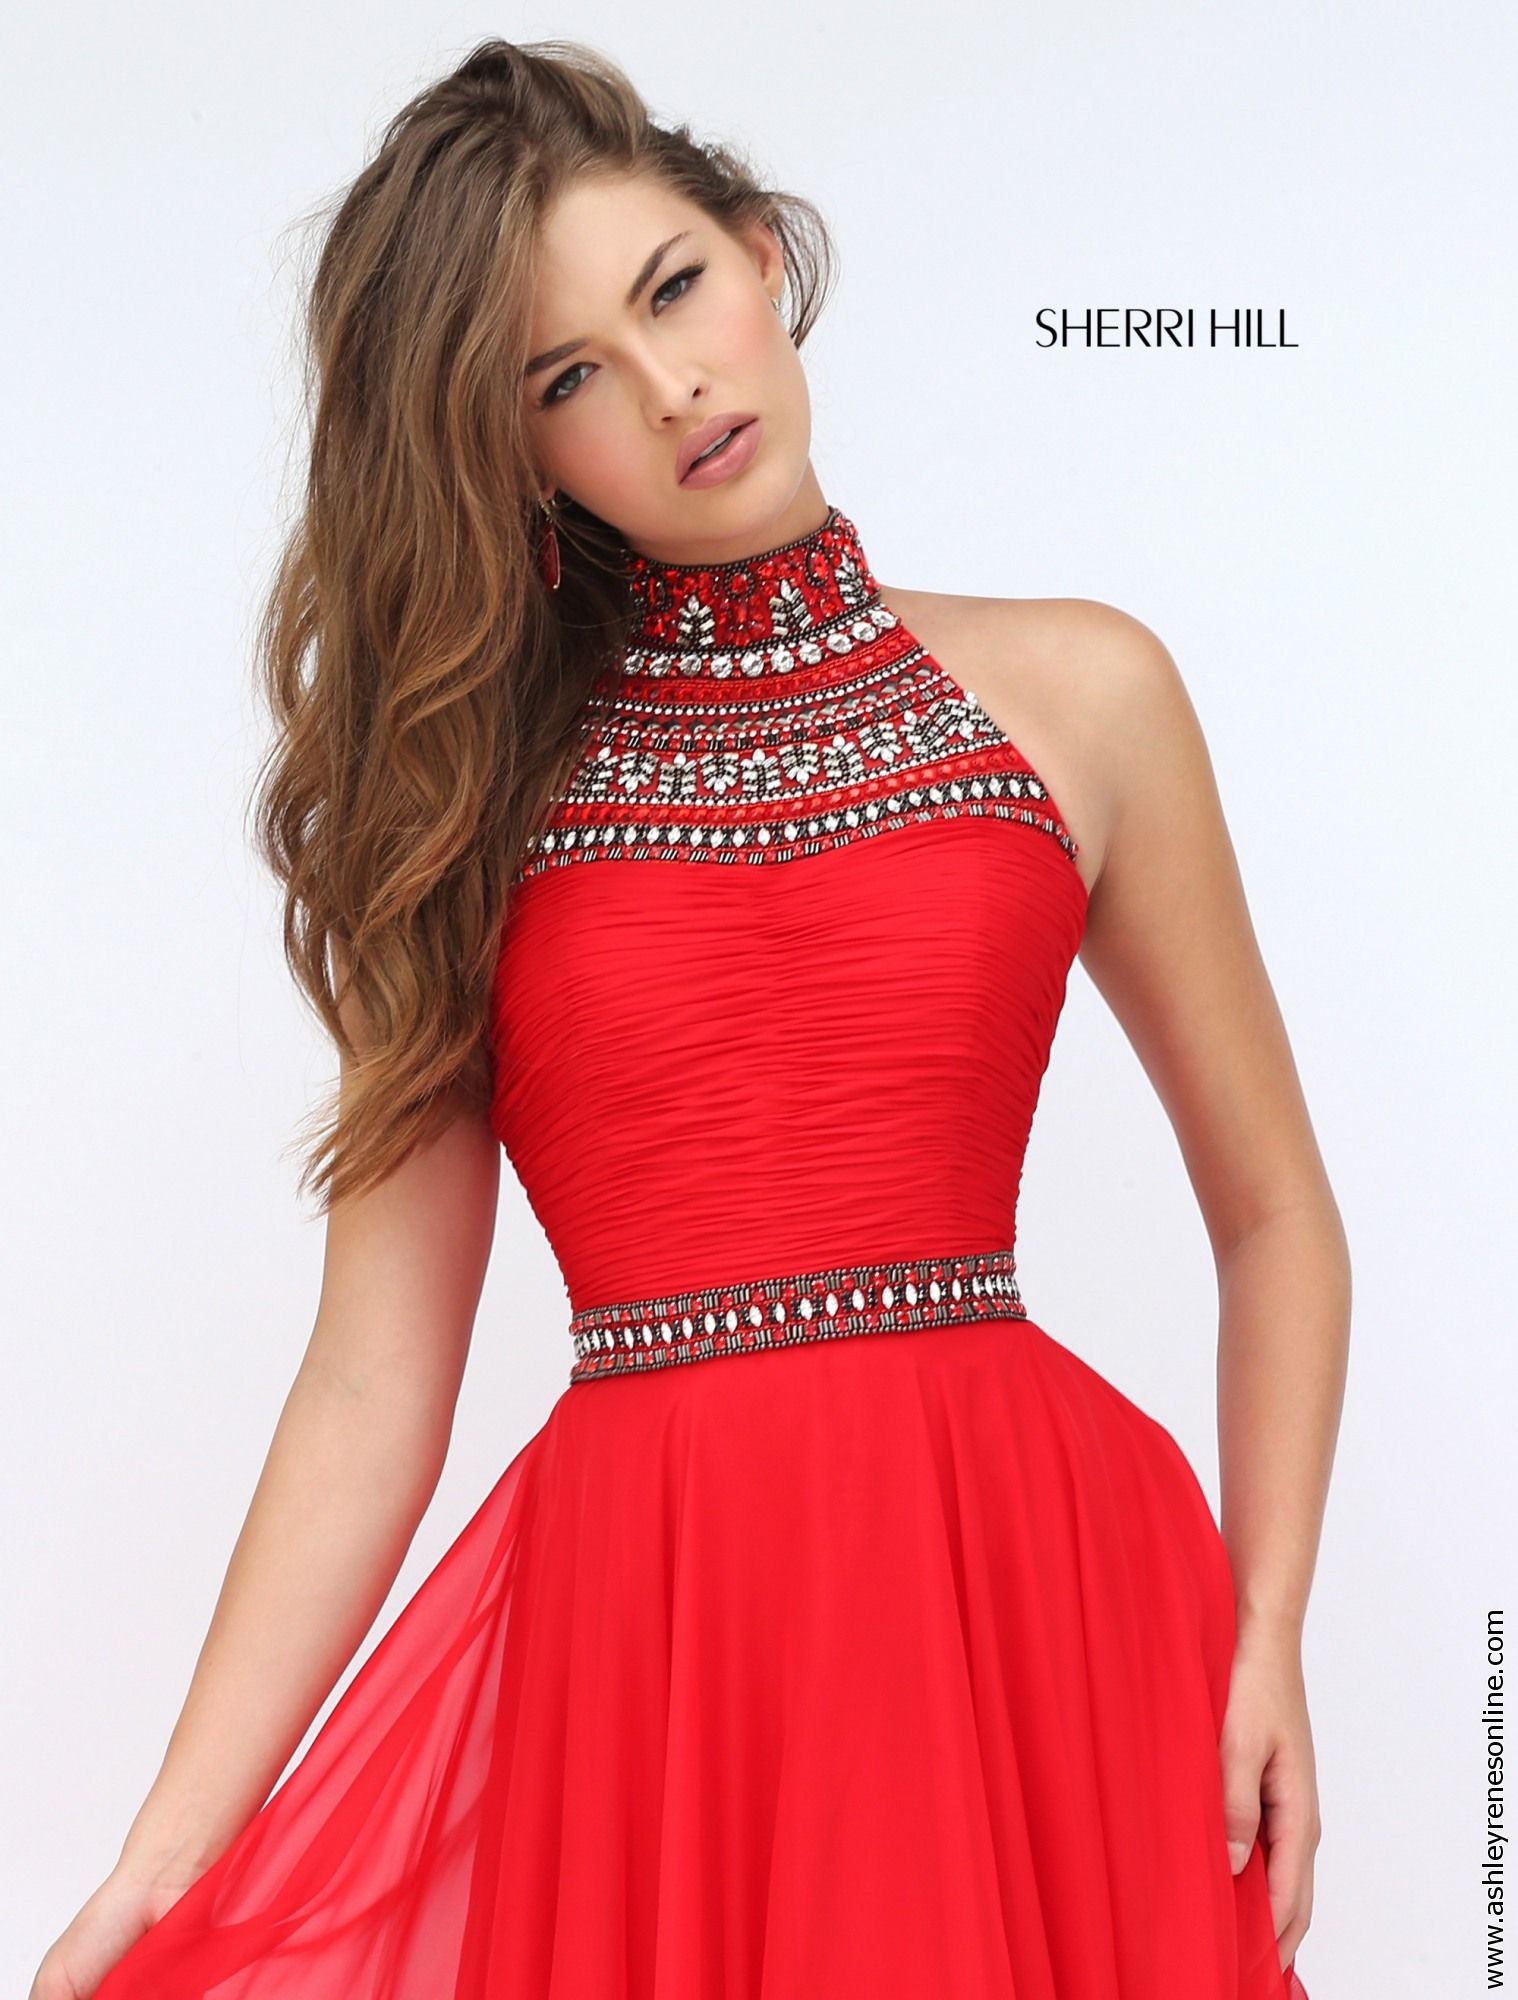 Sherri hill red prom dress at ashley reneus elkhart in